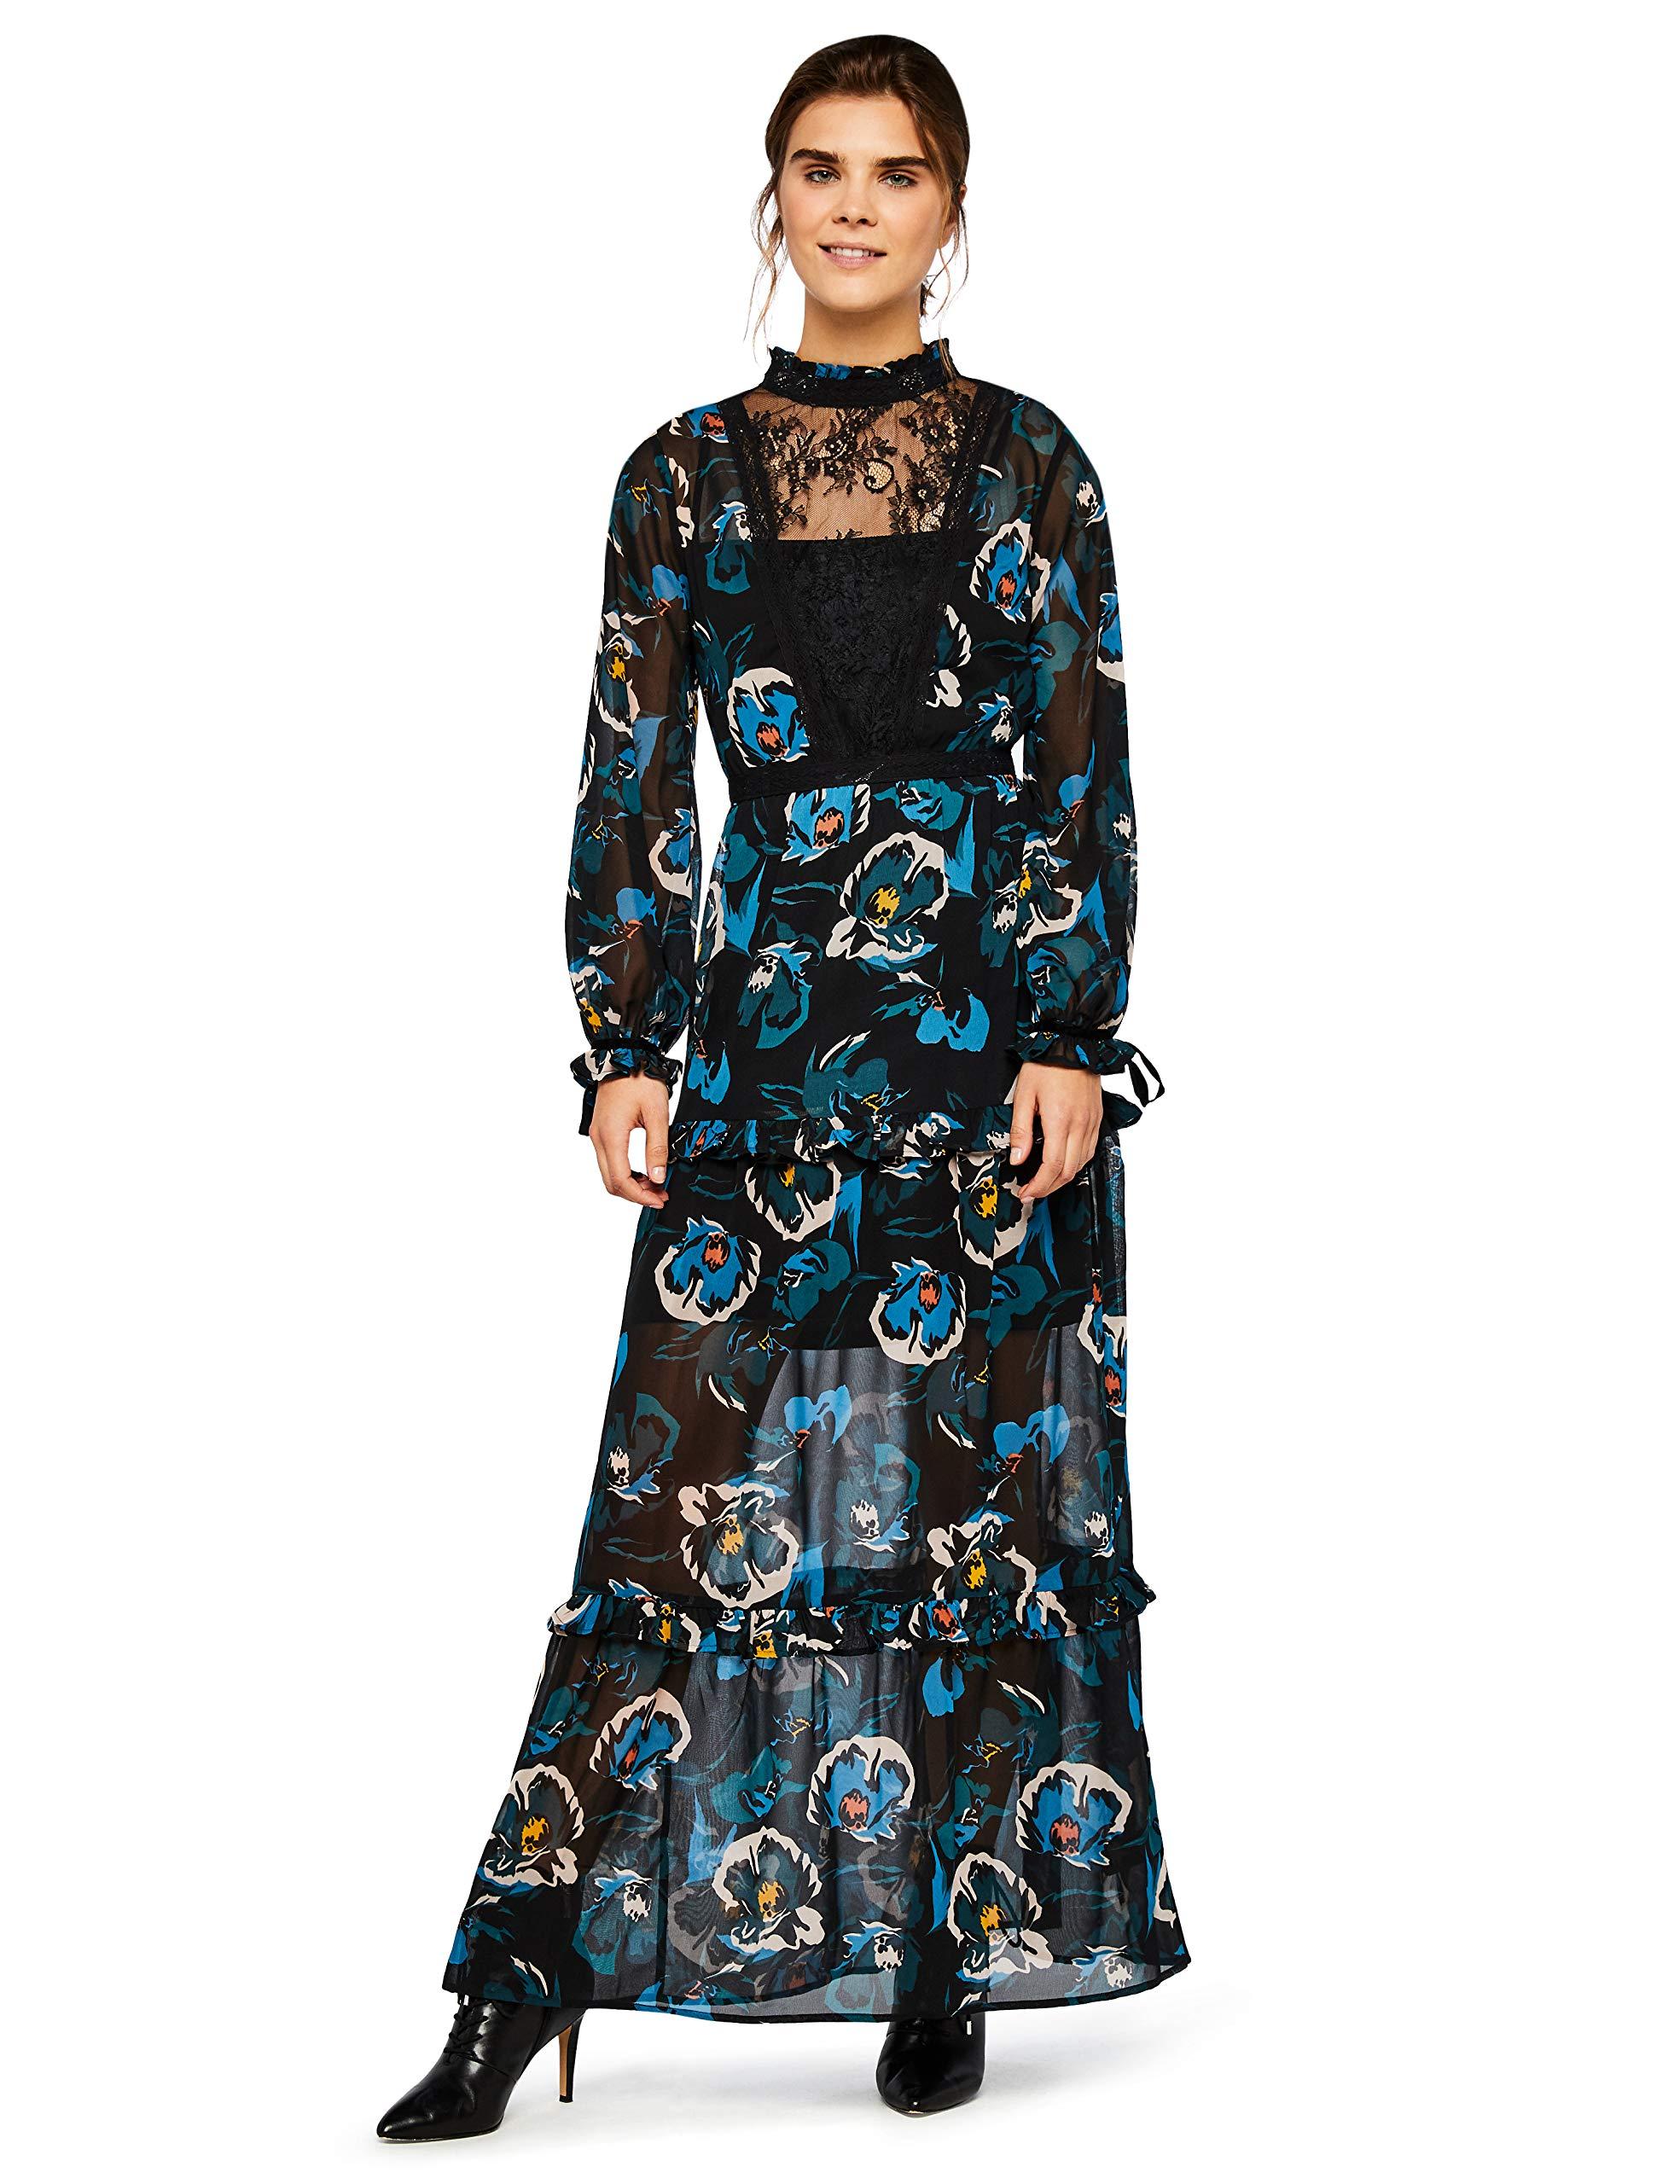 FindWaterfloral SoiréeNoirwater Robe FabricantX large De Maxi Dress Lace With Floral44taille OkXiPZu